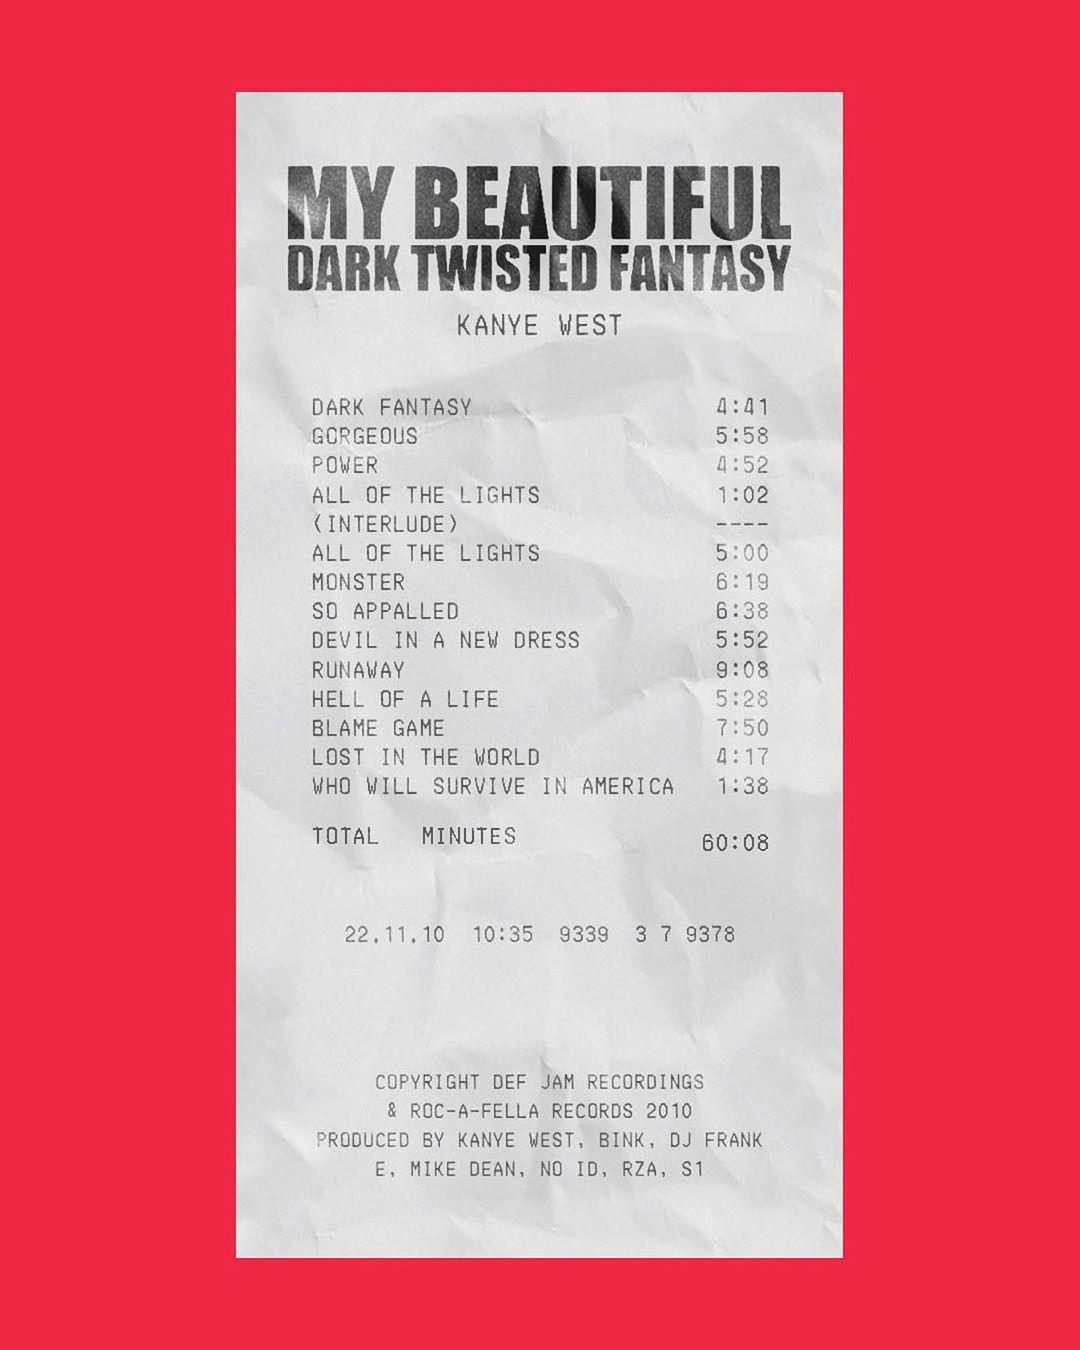 Album Receipts On Instagram My Beautiful Dark Twisted Fantasy By Kanye West In 2020 Beautiful Dark Twisted Fantasy Kanye West Album Cover Kanye West Wallpaper